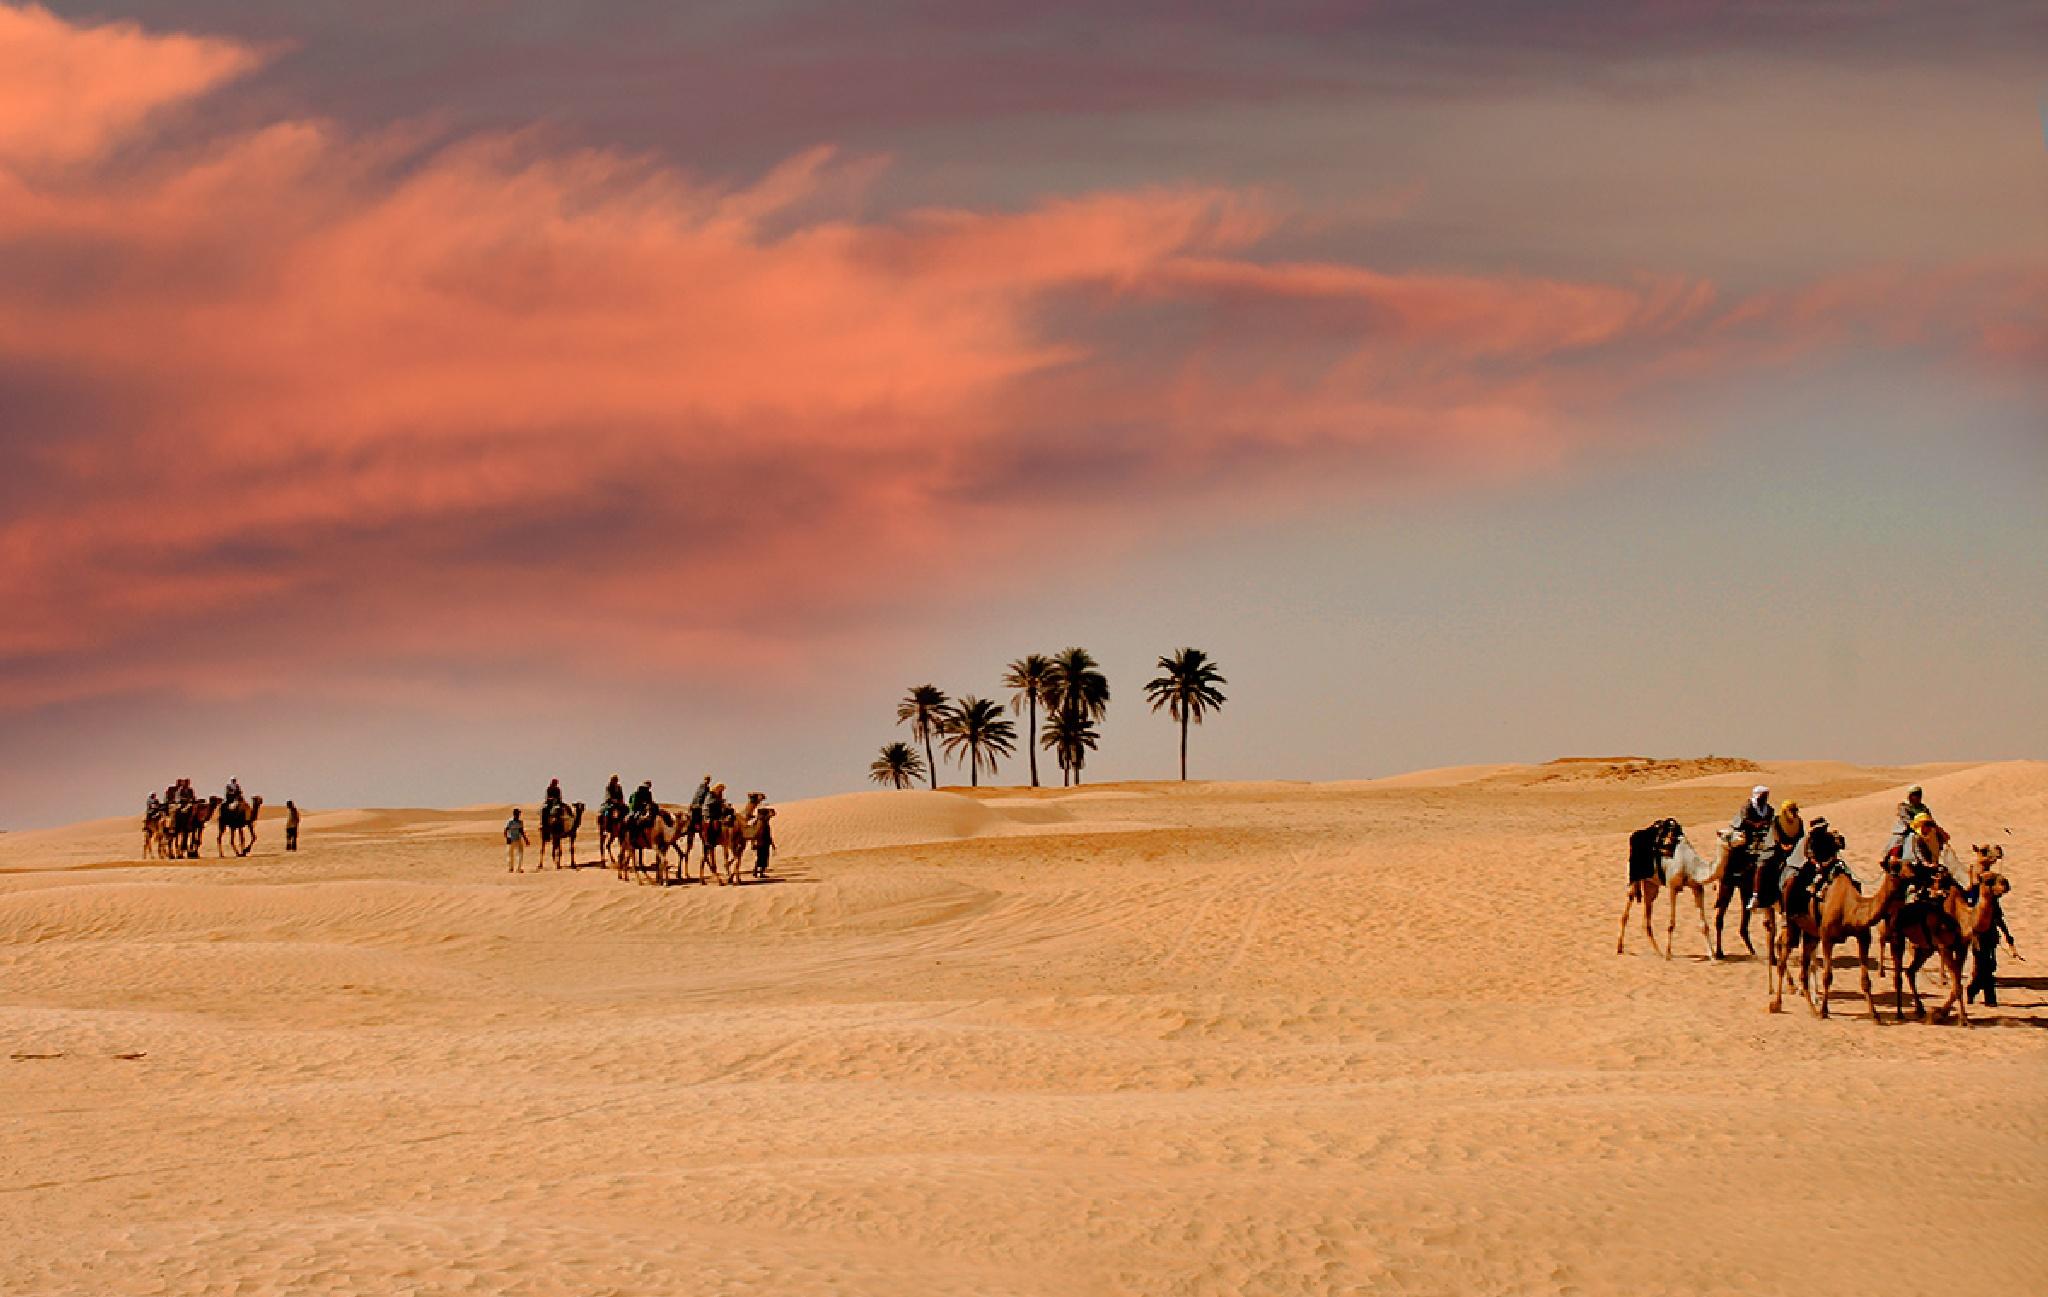 Sunset, Camel Caravans  by Sotiris Siomis